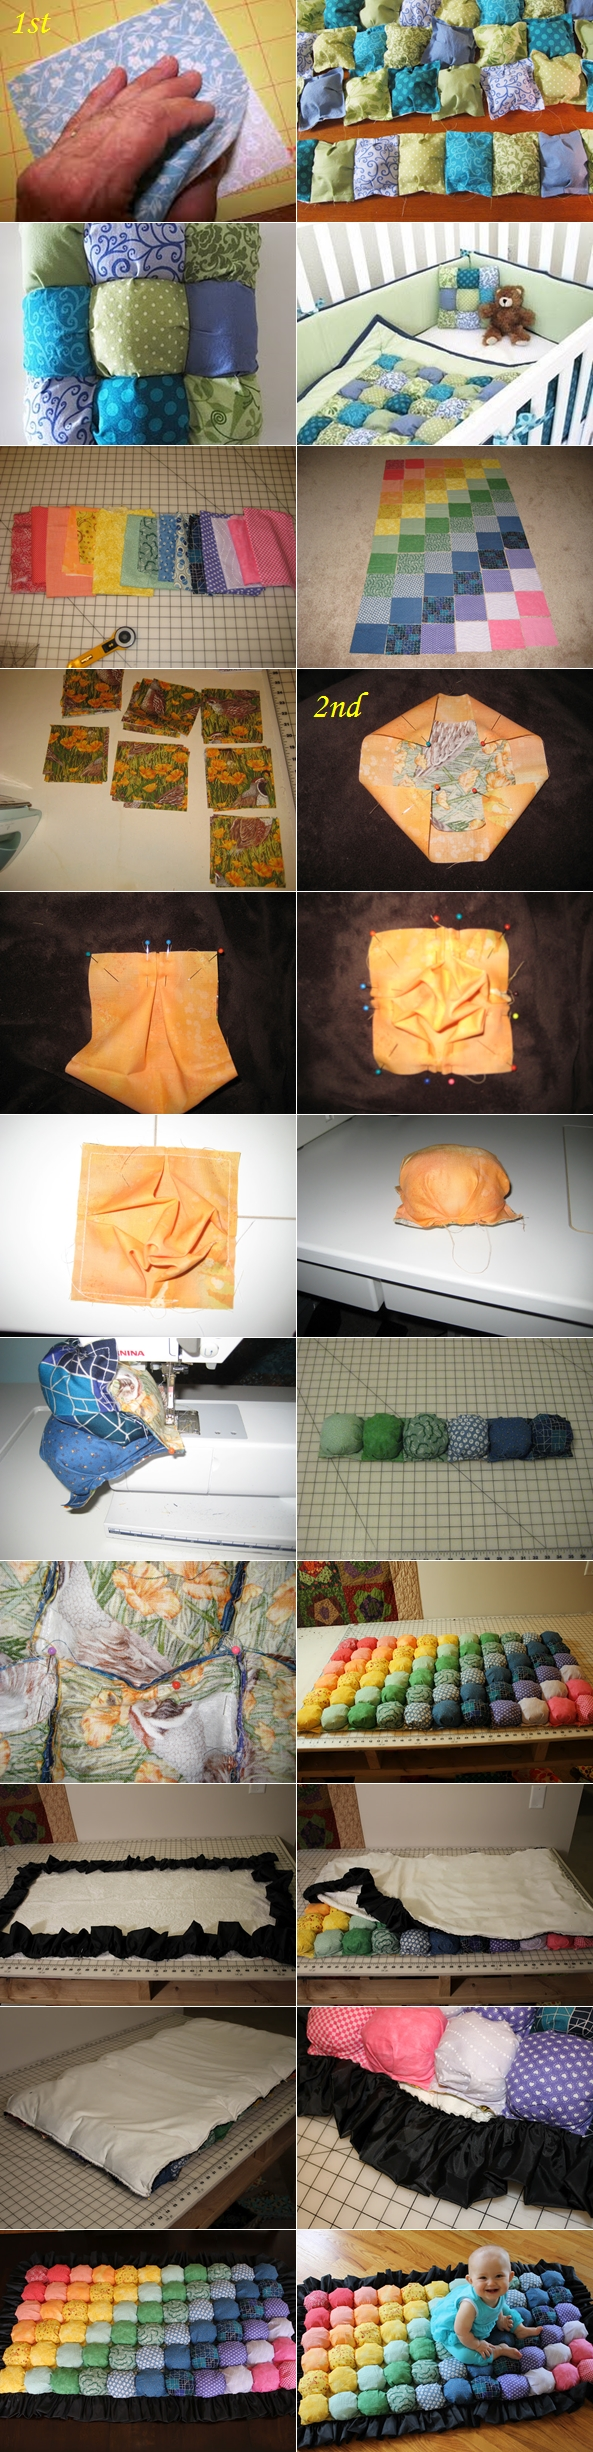 DIY Bubble Quilt or Biscuit Quilt Tutorial